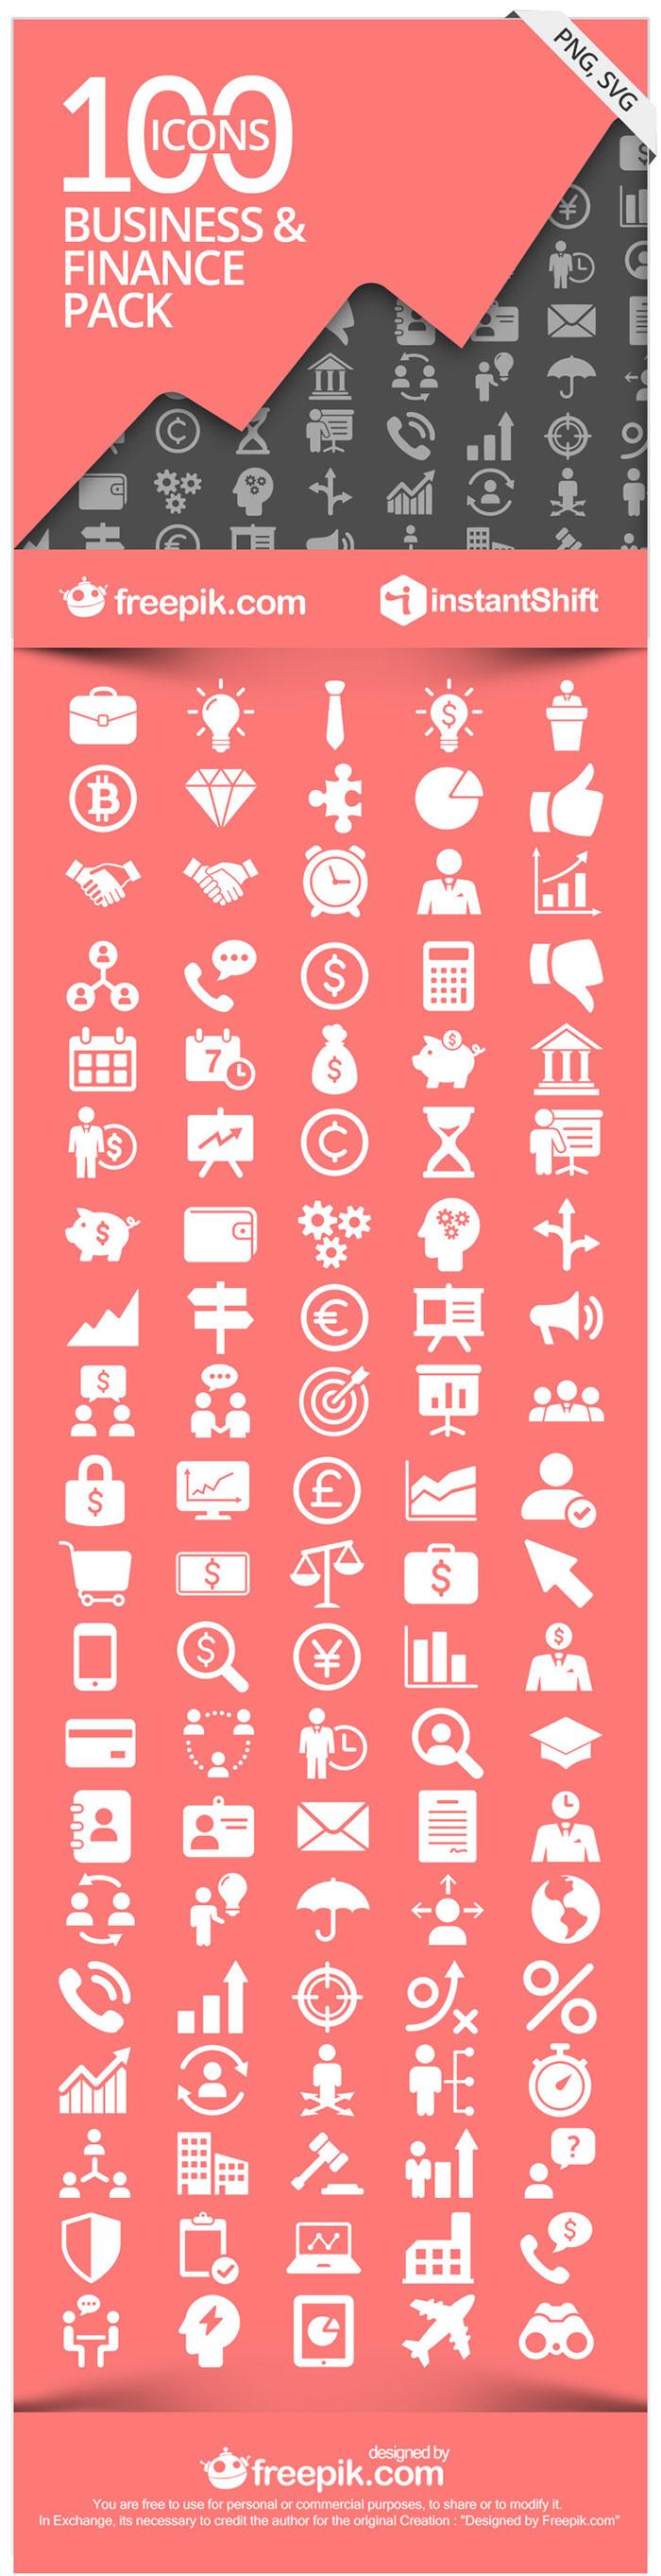 FinBiz - The Free Business & Finance Icon Set